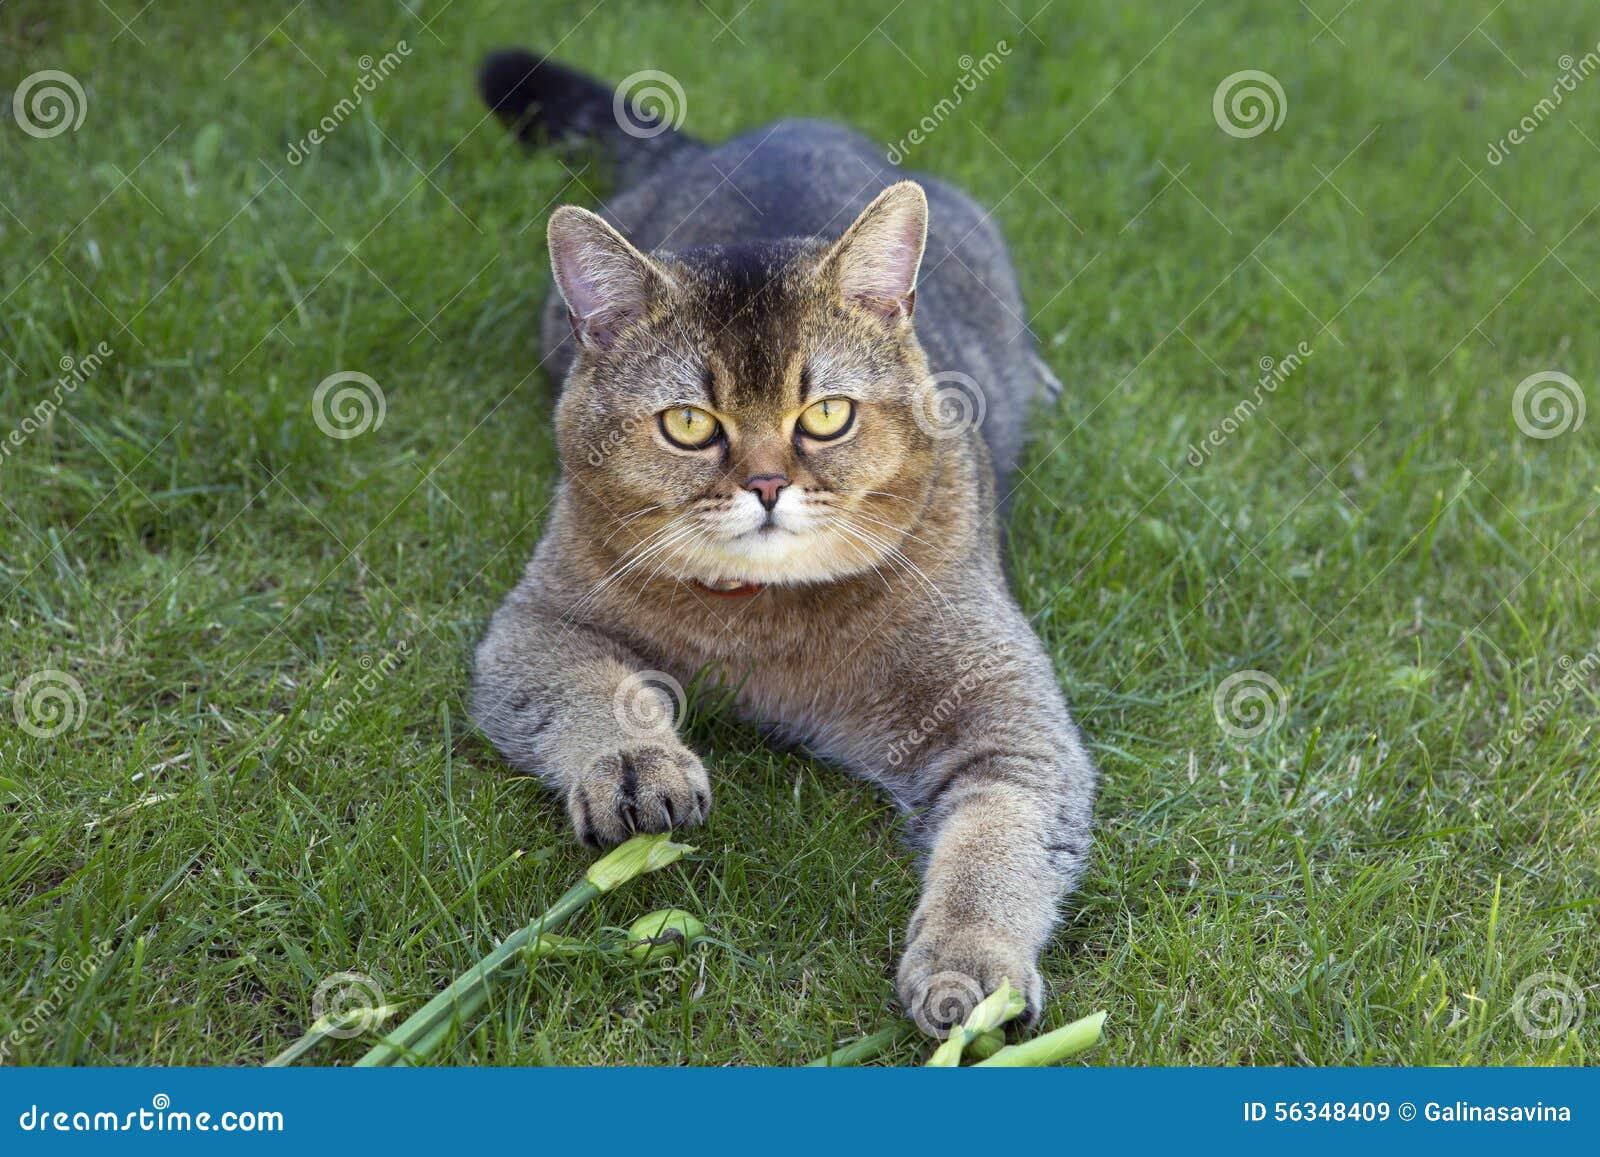 Gold Chinchilla (cat). Breed of cats of chinchilla